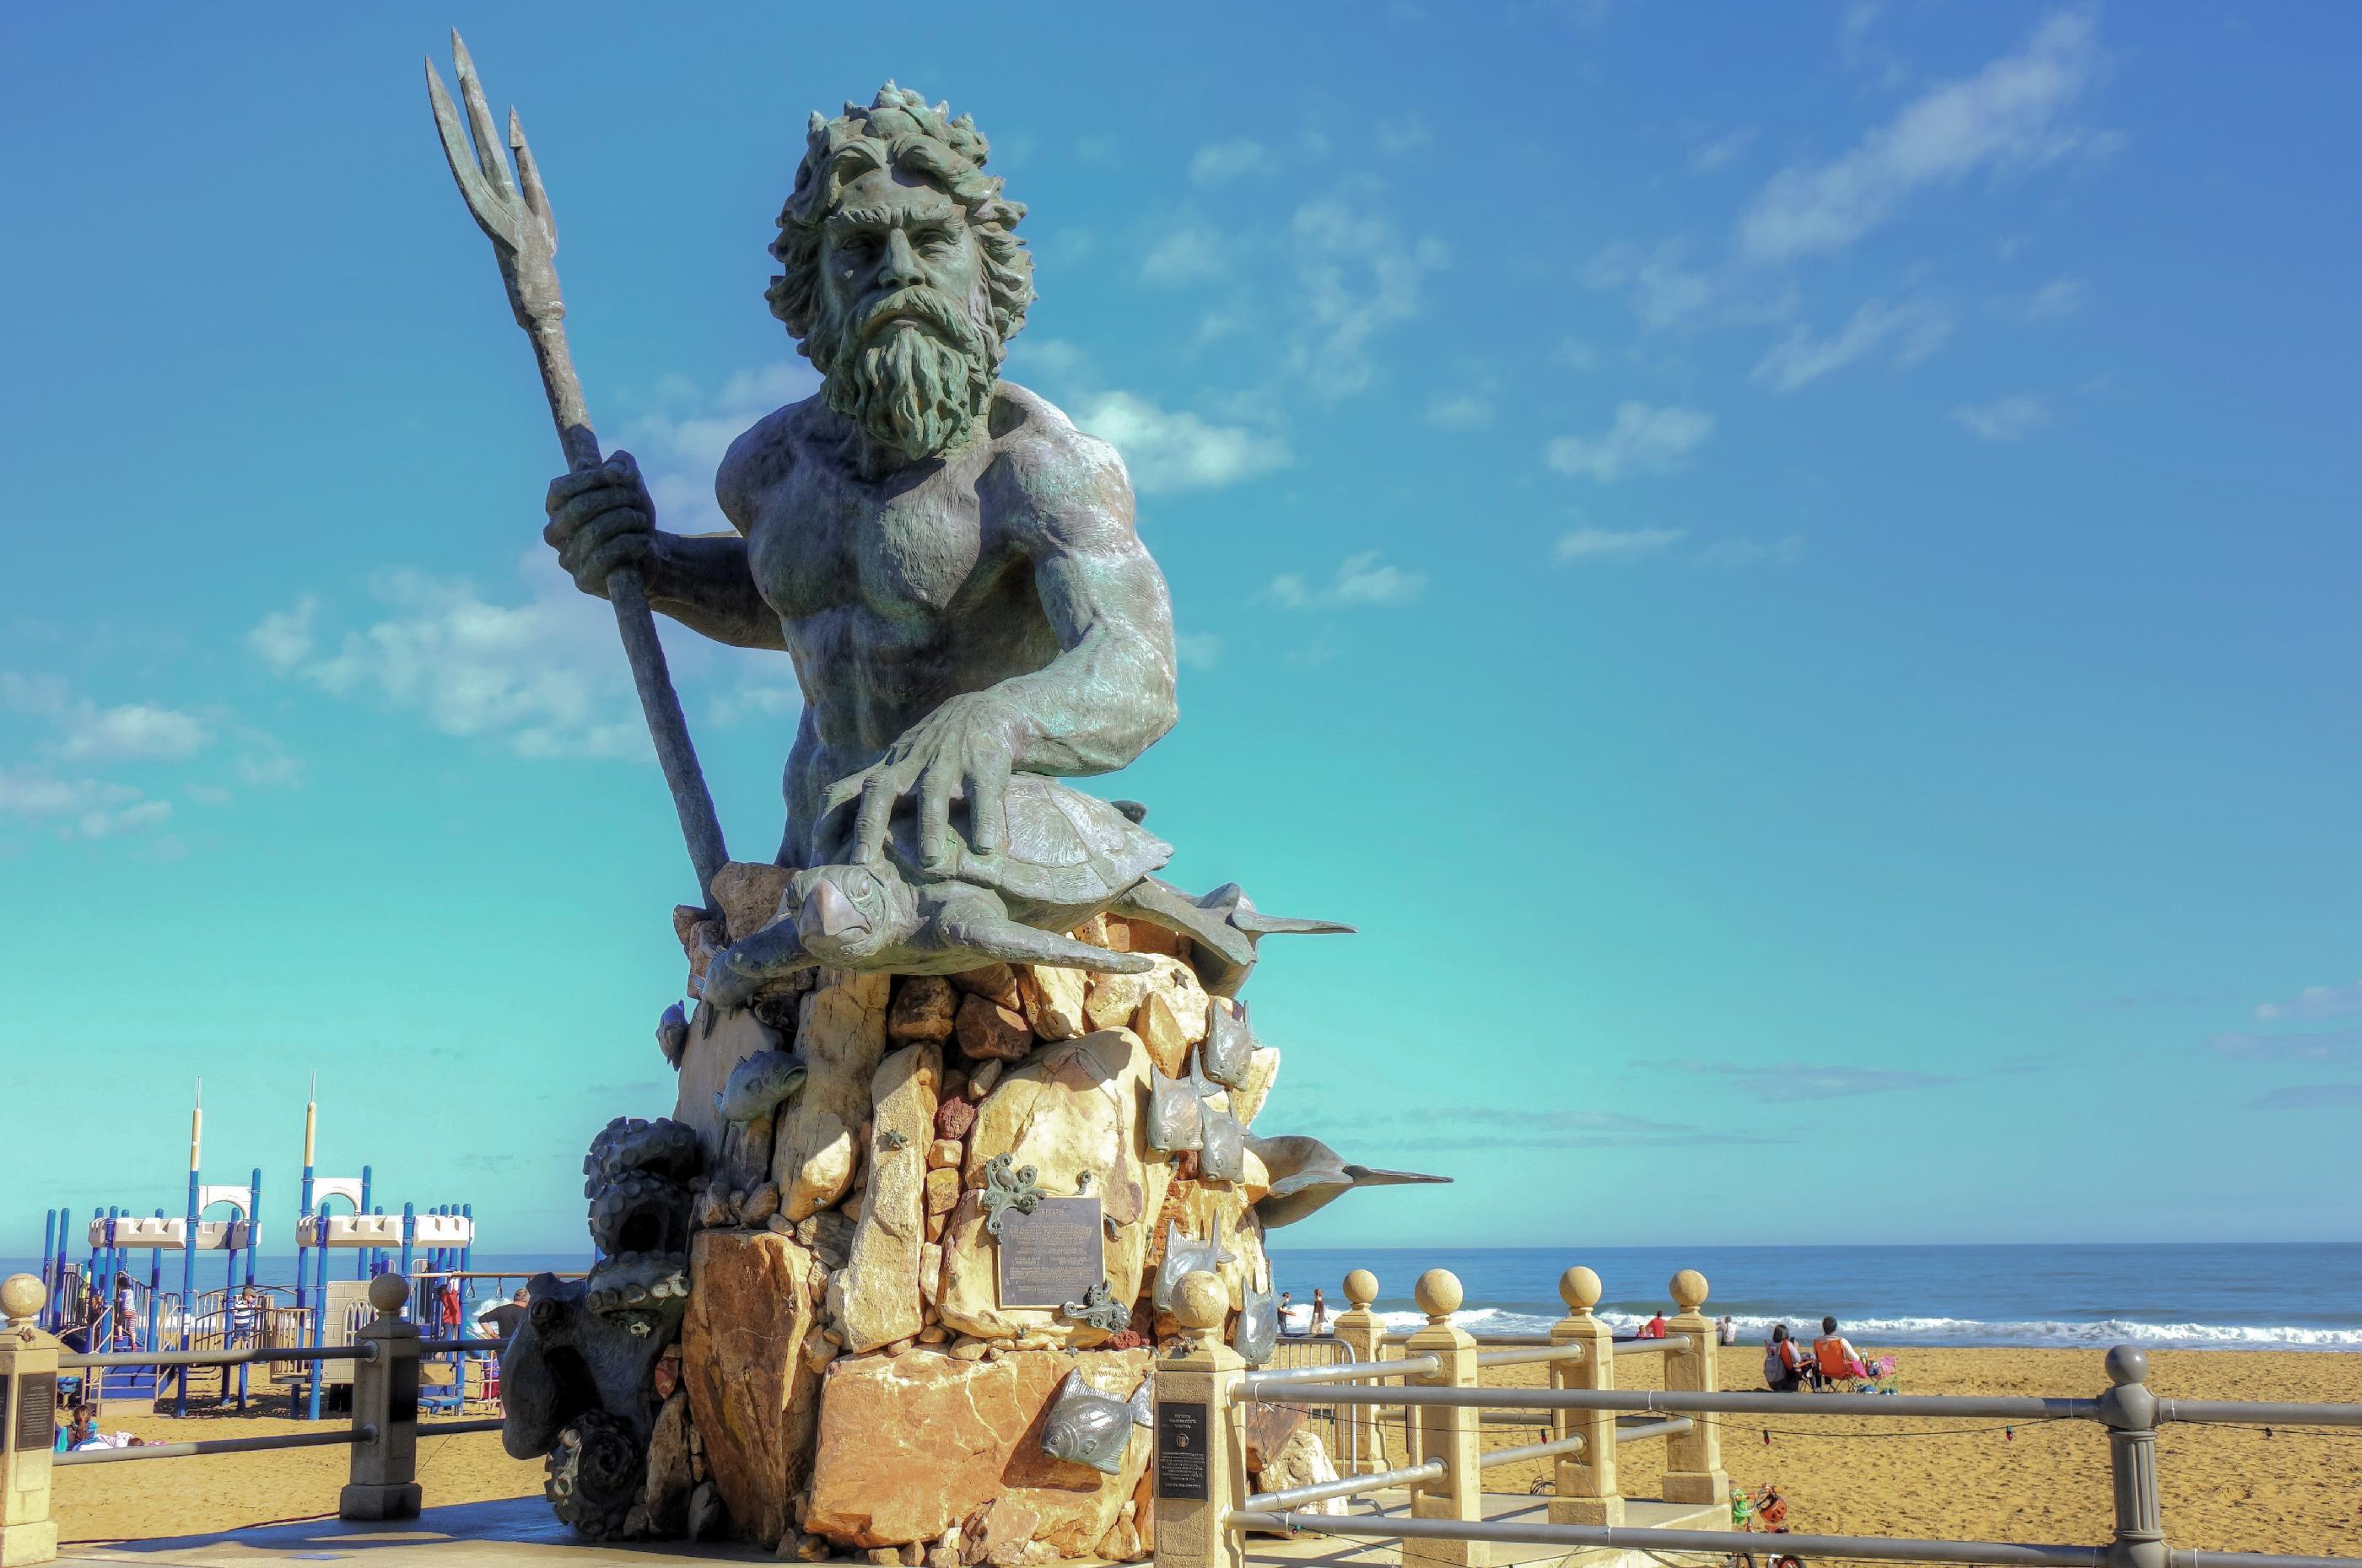 The statue of King Neptune, Virginia Beach Boardwalk